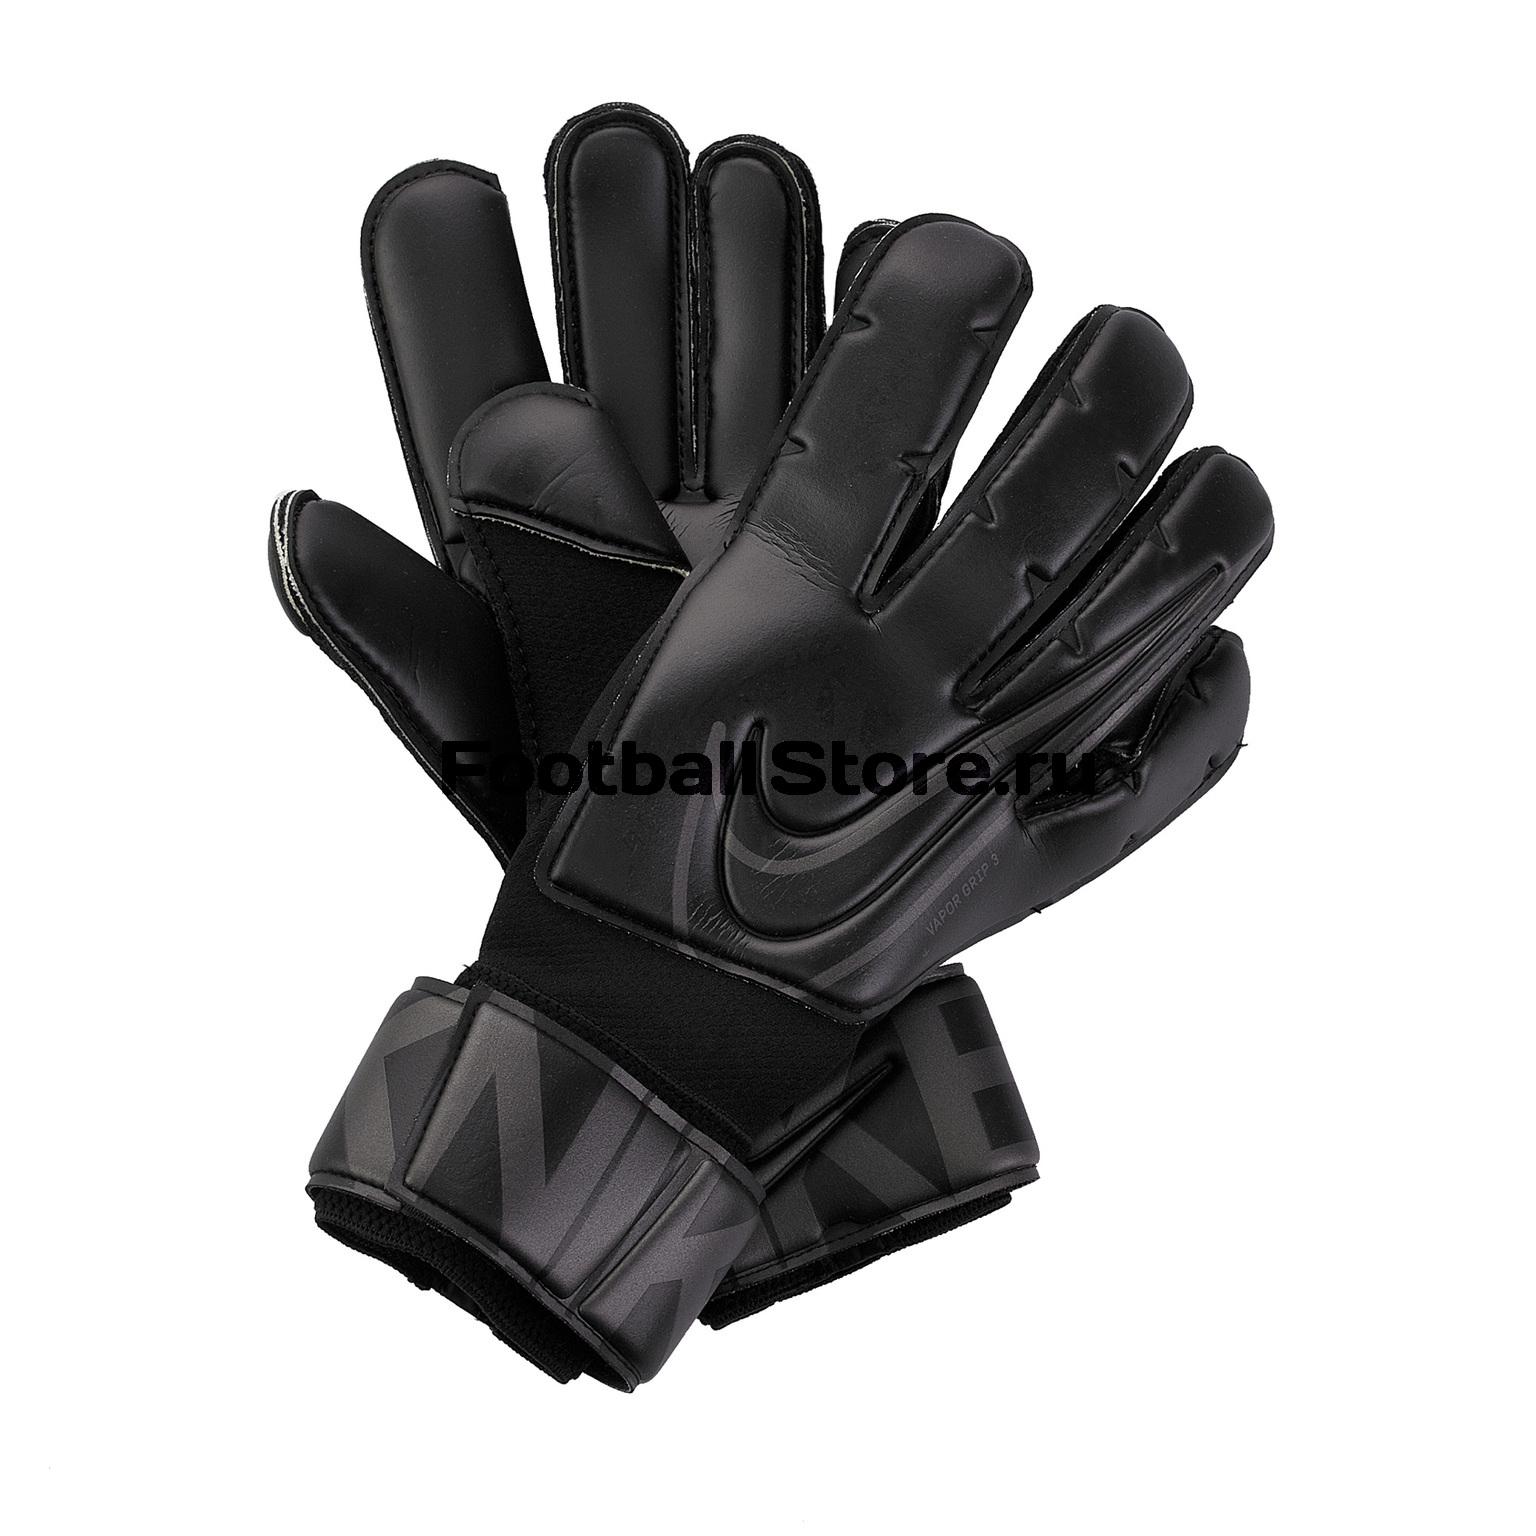 цена на Перчатки вратарские Nike Vapor Grip 3 GS3884-010